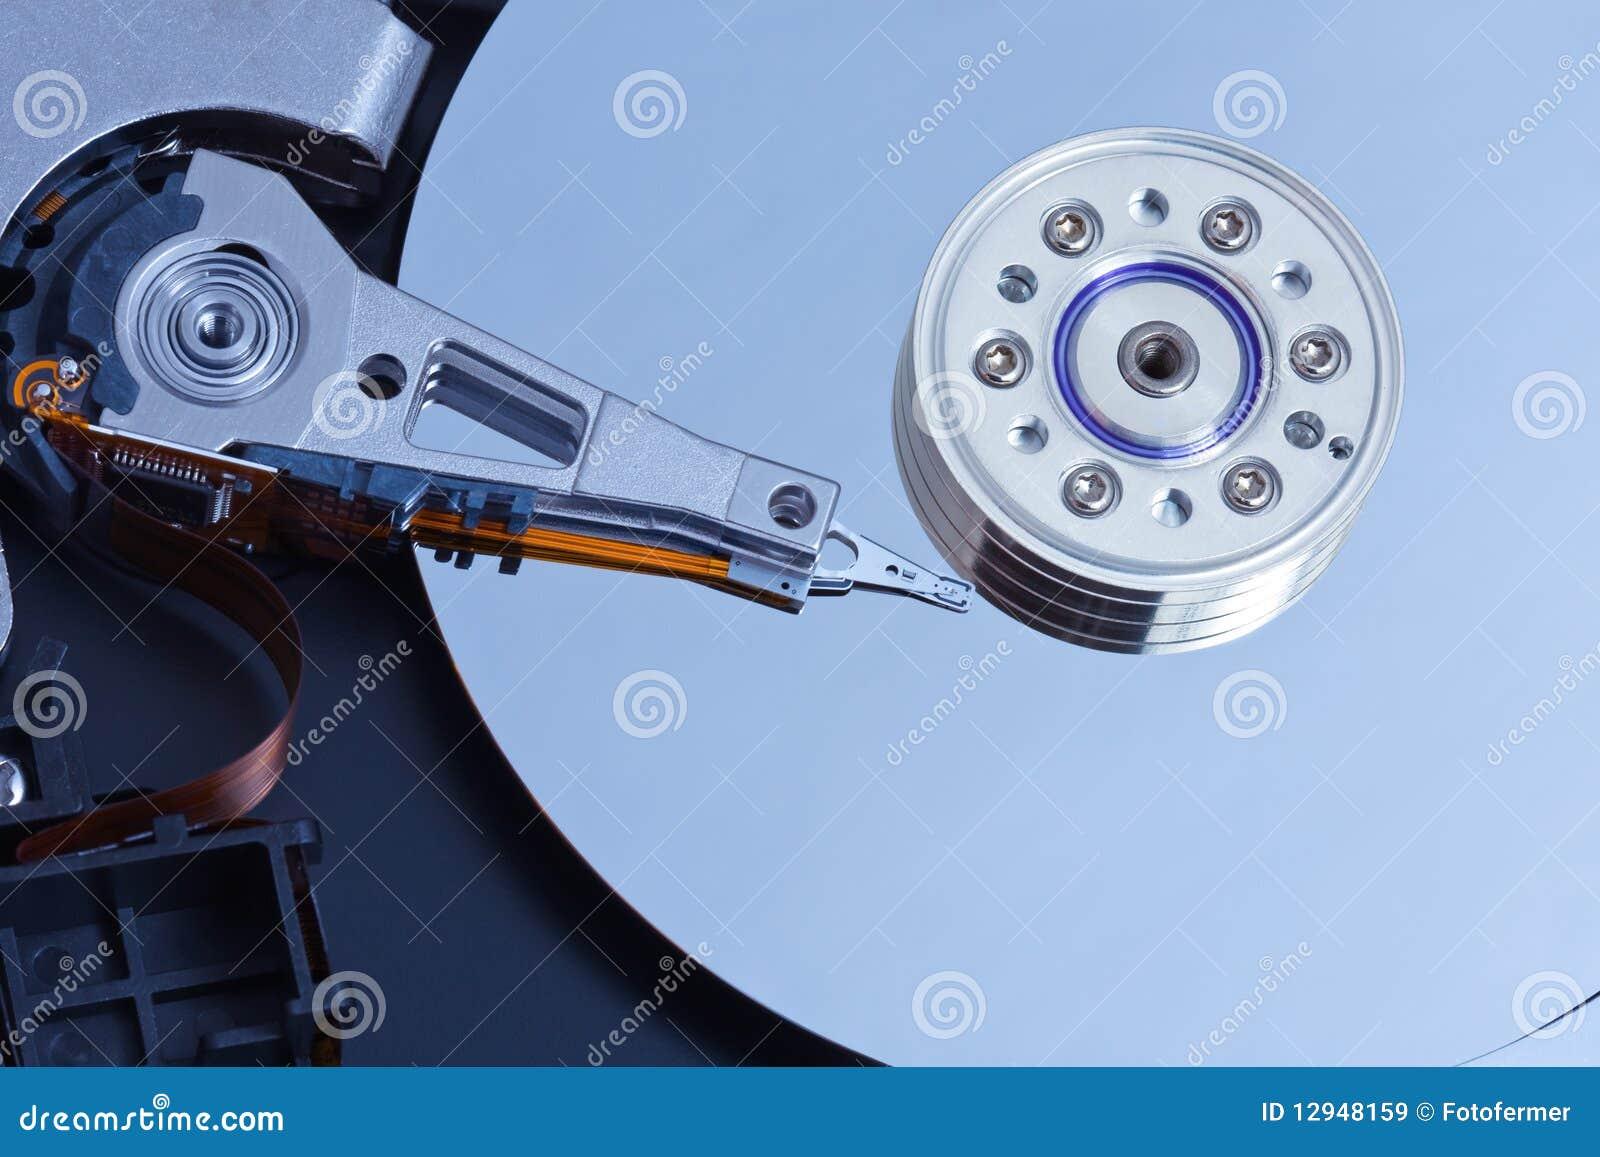 how to read internal hard drive externally